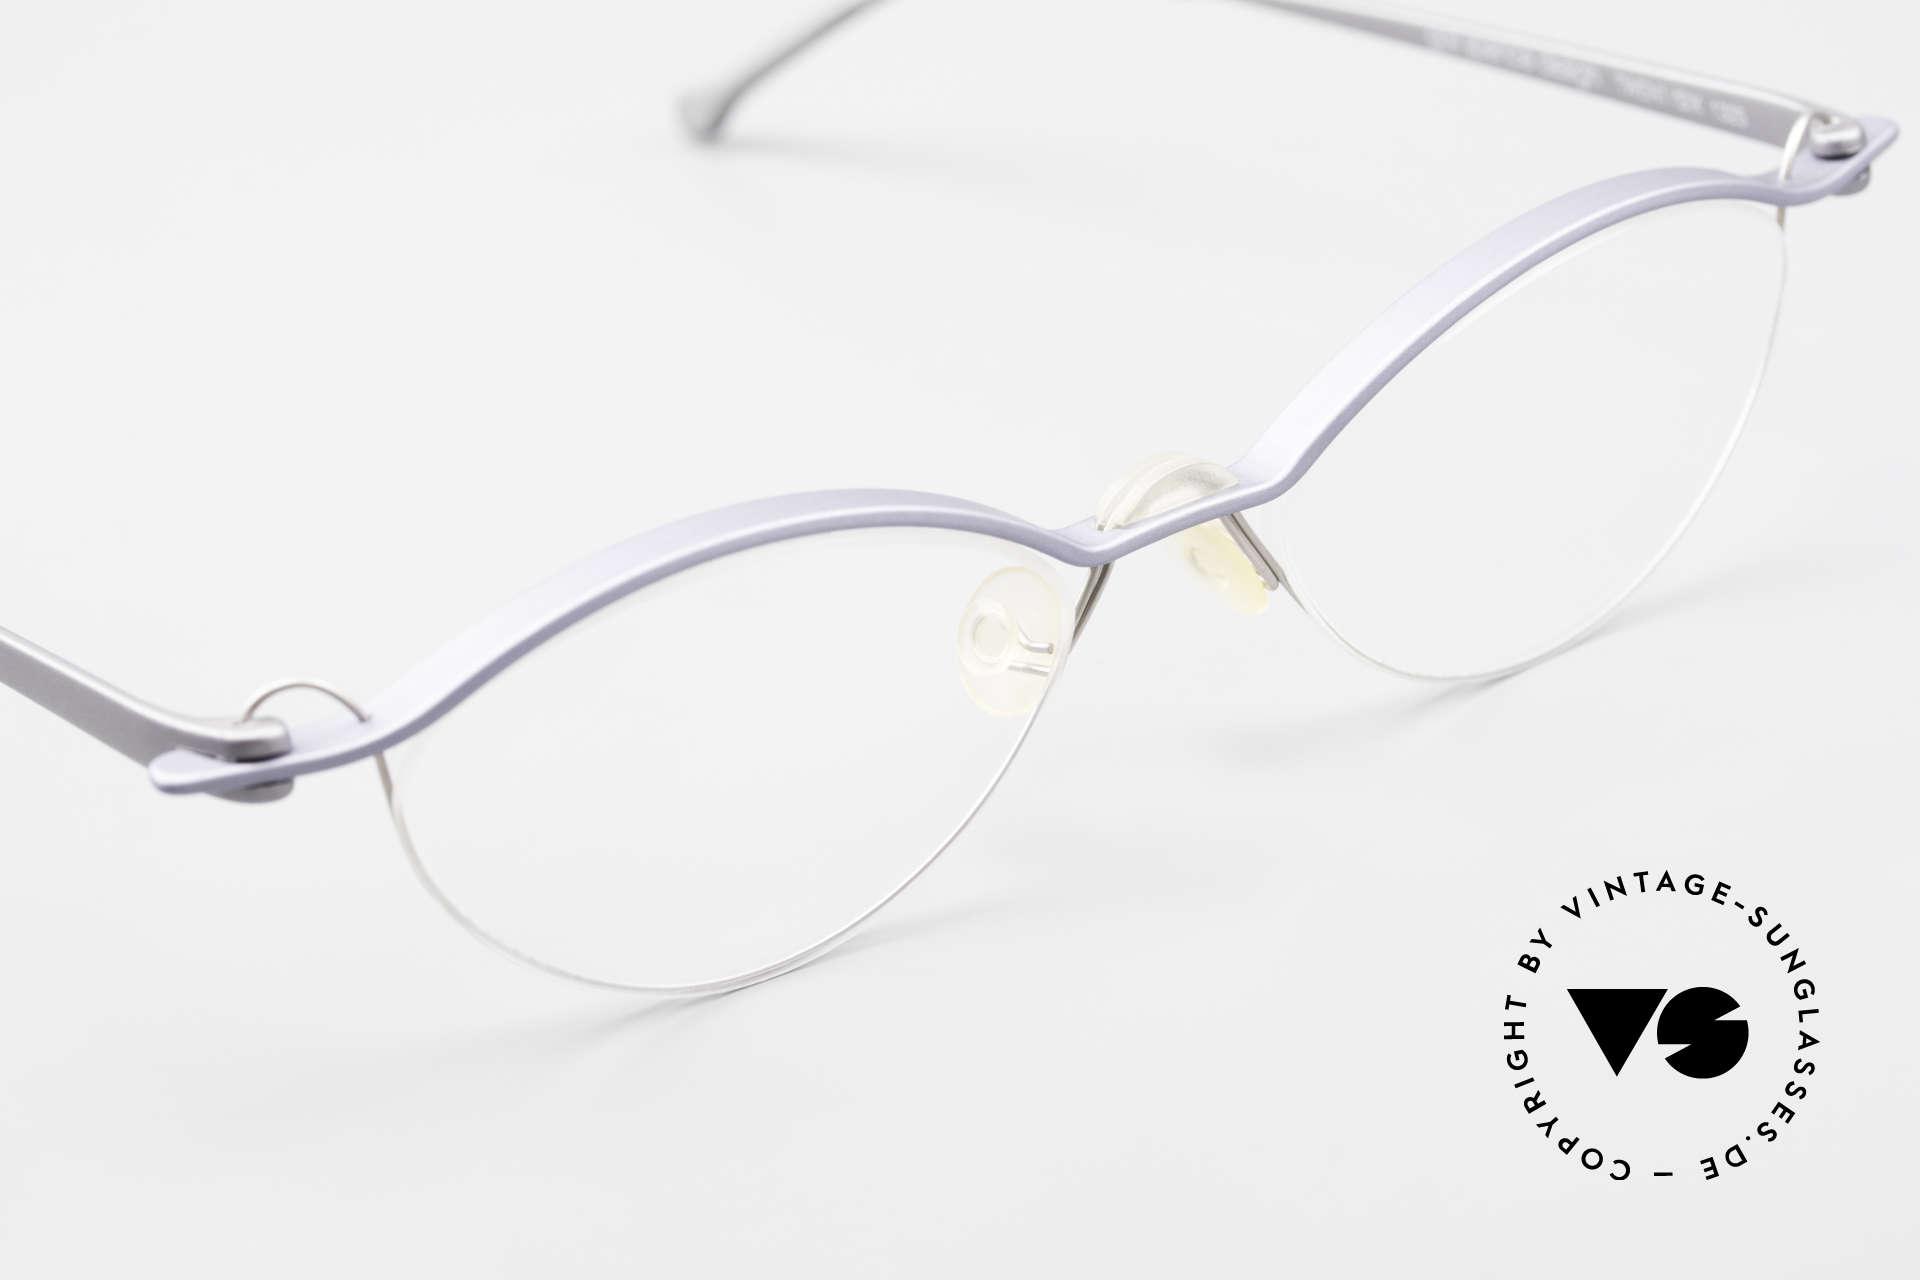 ProDesign No26 Aluminium Gail Spence Frame, unworn (like all our rare vintage ProDesign eyewear), Made for Men and Women